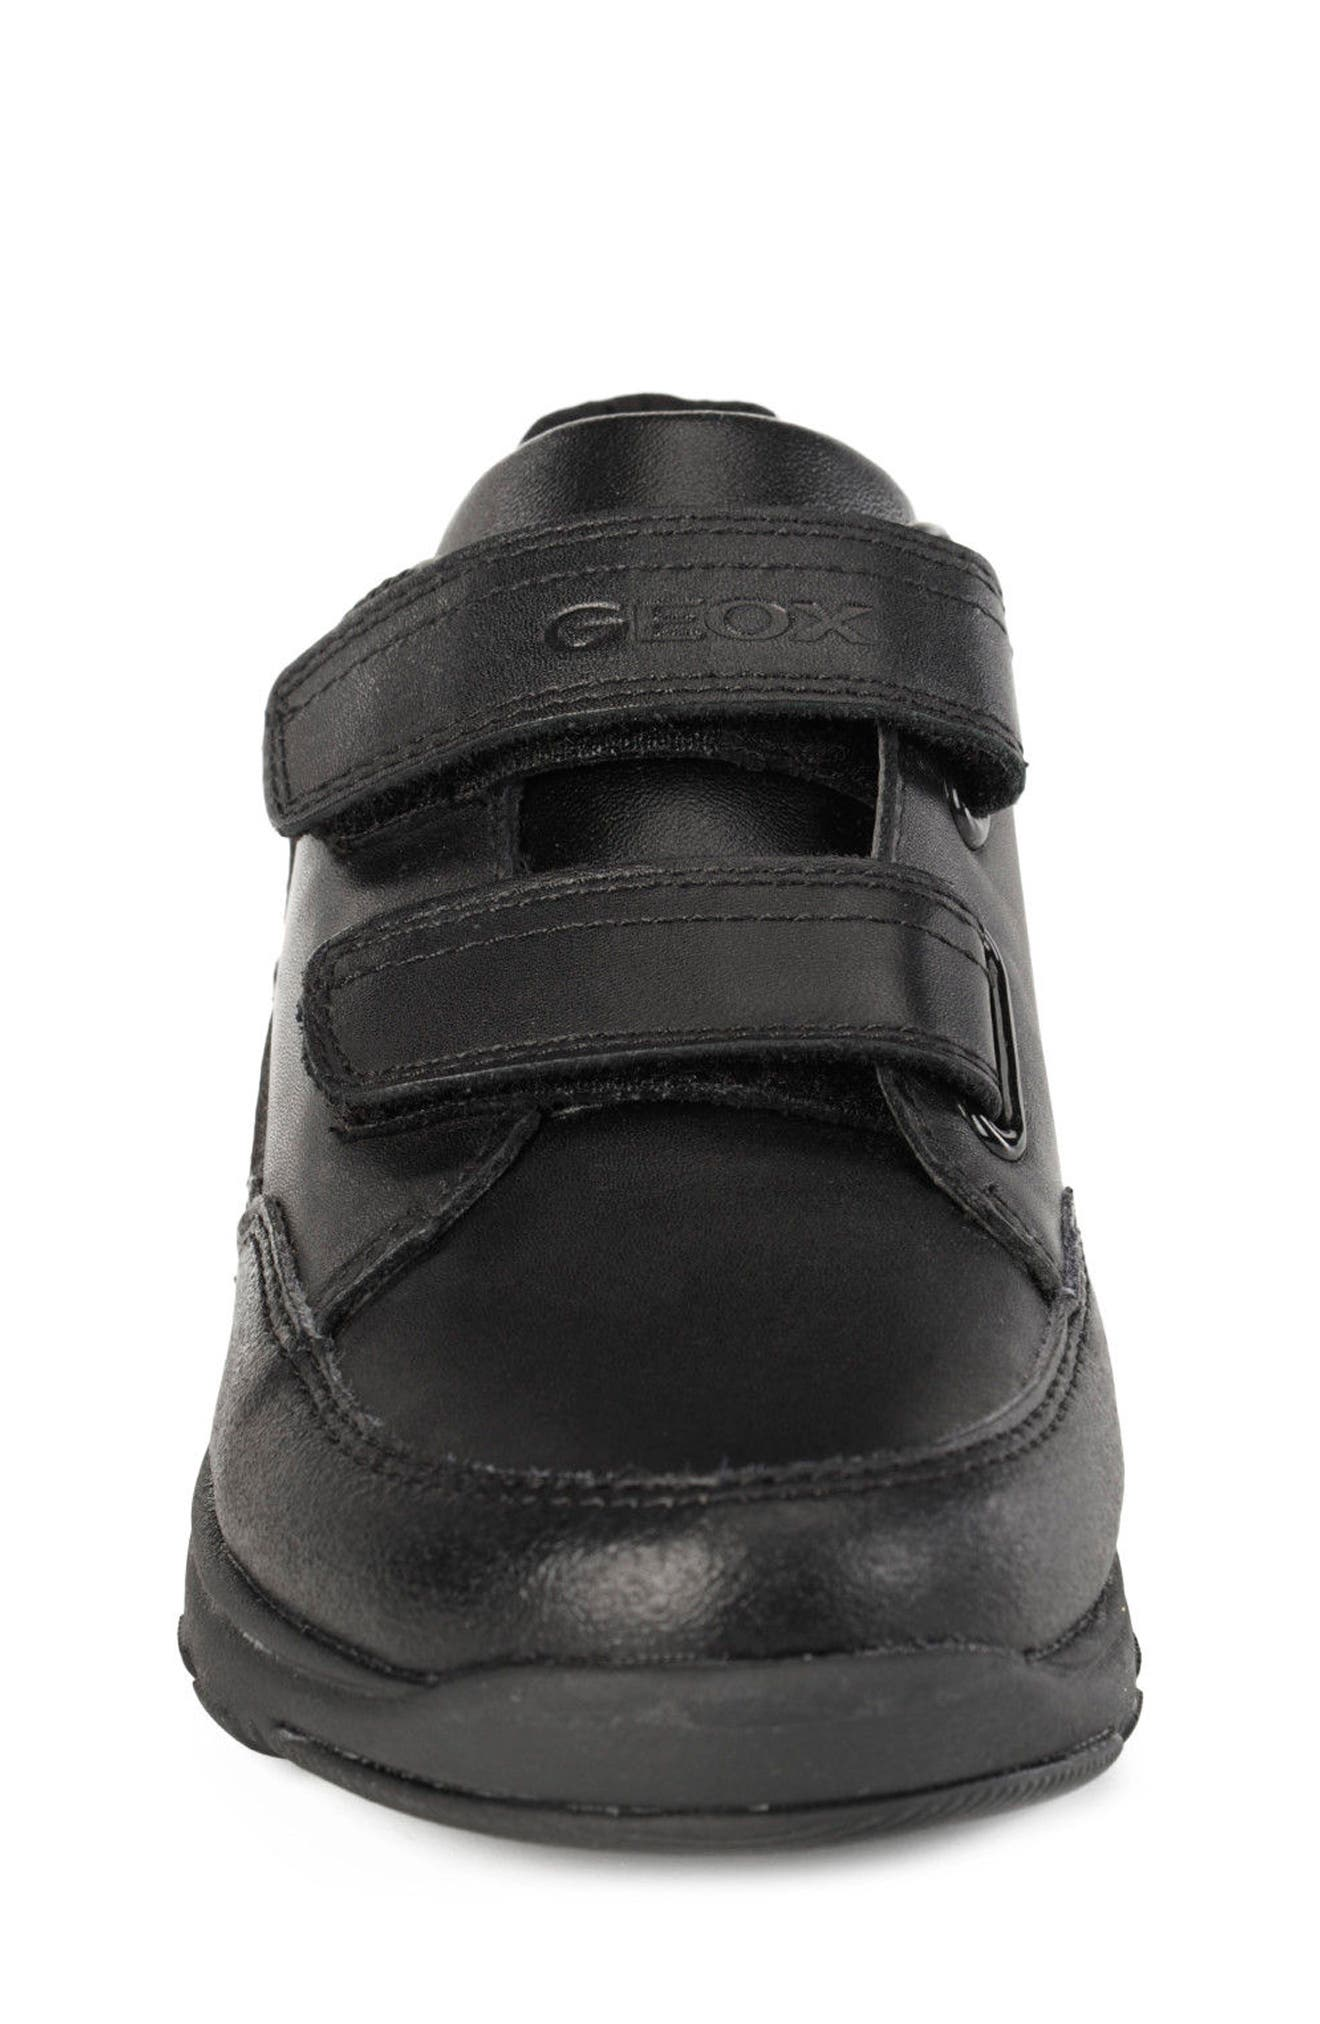 Xunday Low Top Sneaker,                             Alternate thumbnail 4, color,                             BLACK